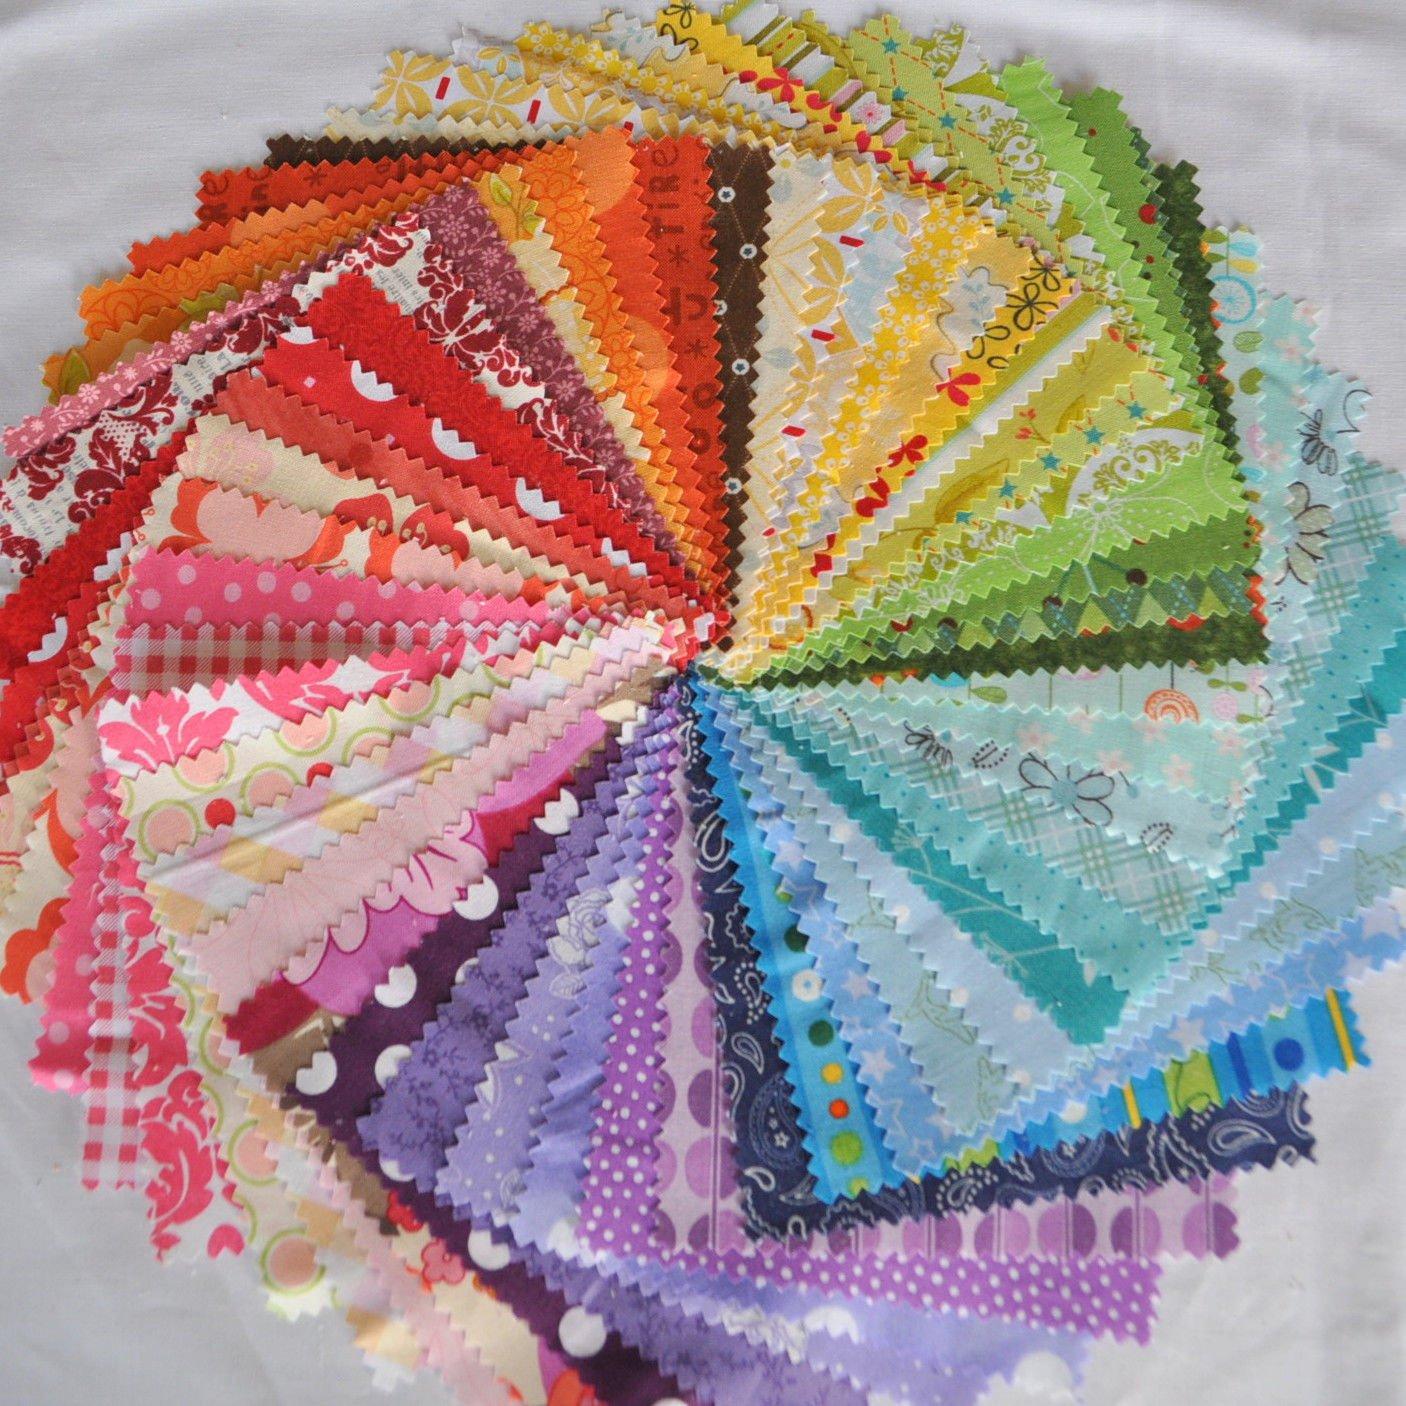 Designer Fabric 5 Squares Charm Pack Rainbow, 50 Different Pieces, 100% Cotton